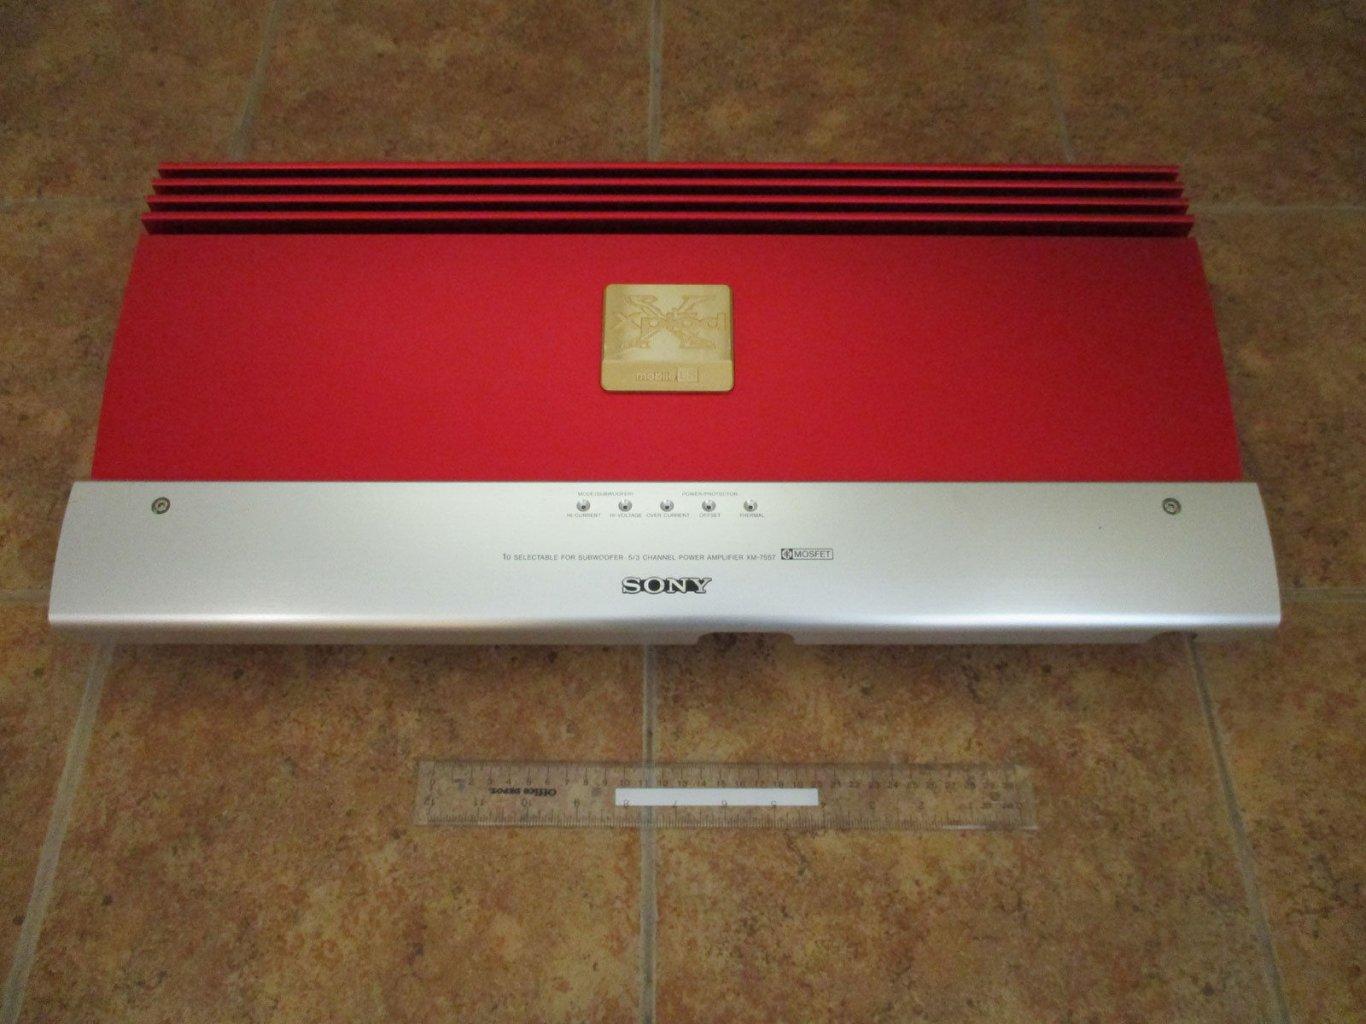 Sony Amp.jpg